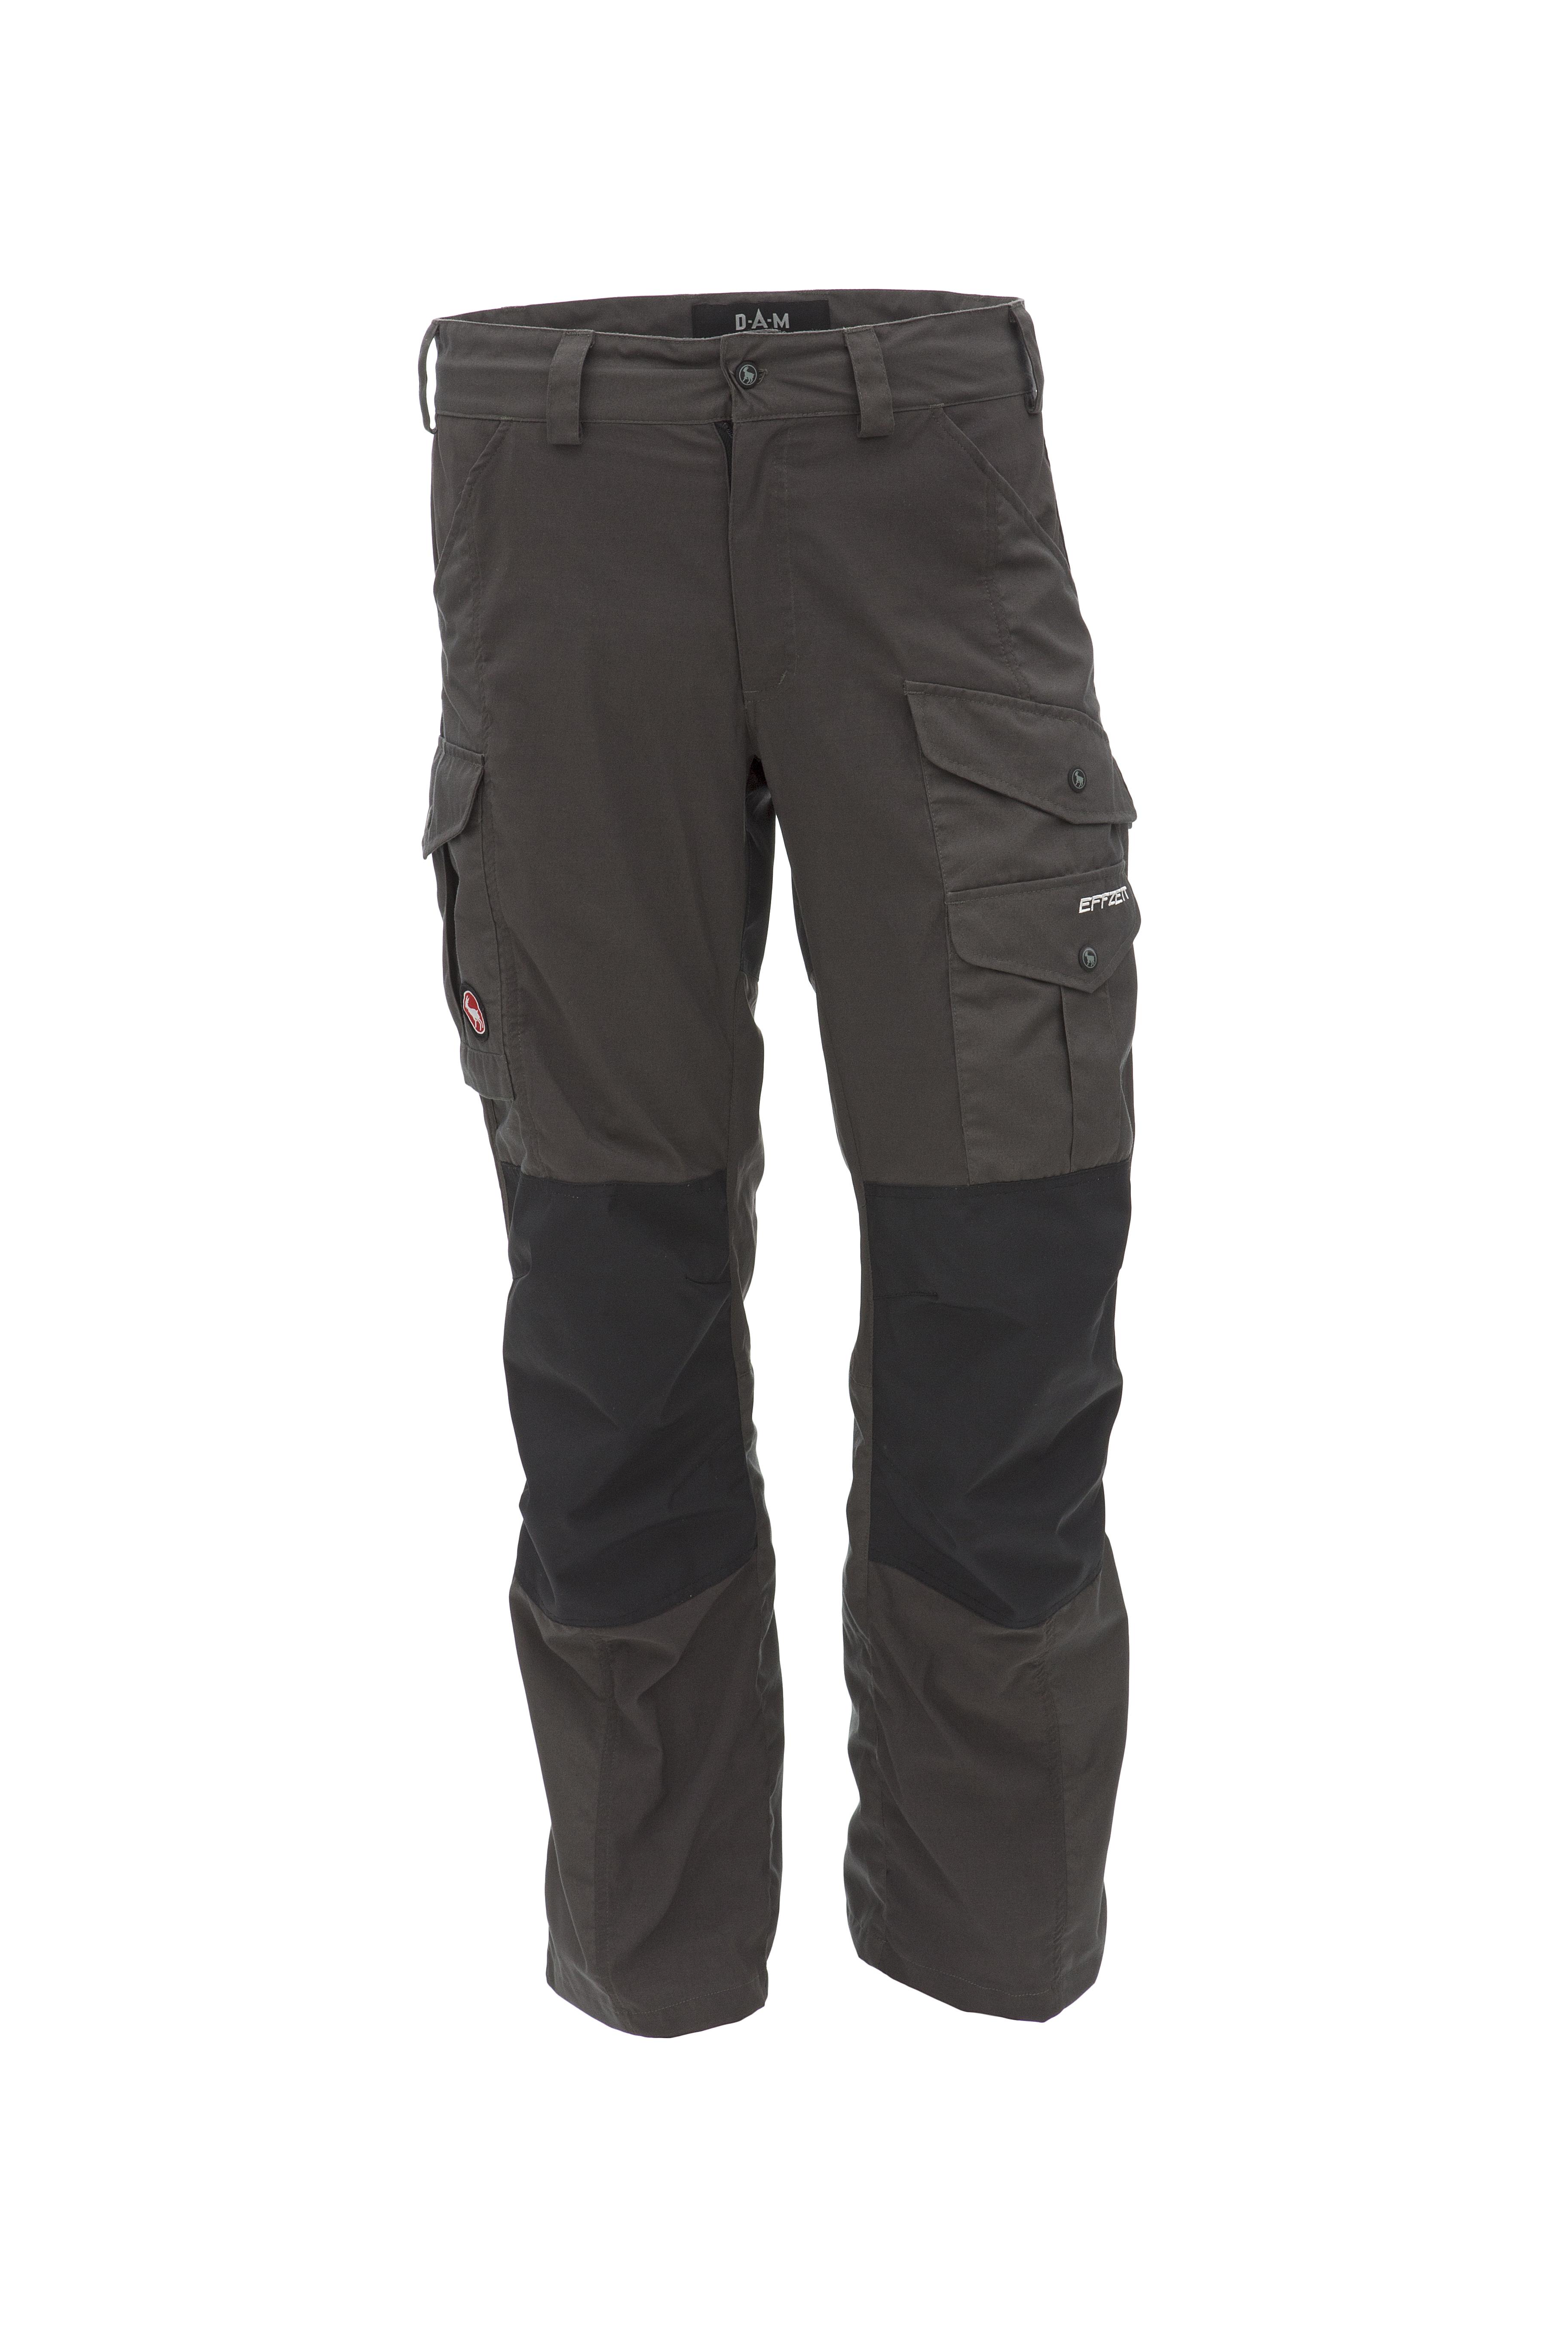 D.A.M. Effzett Combat Trousers – Glasgow Angling Centre 35246db9b218a